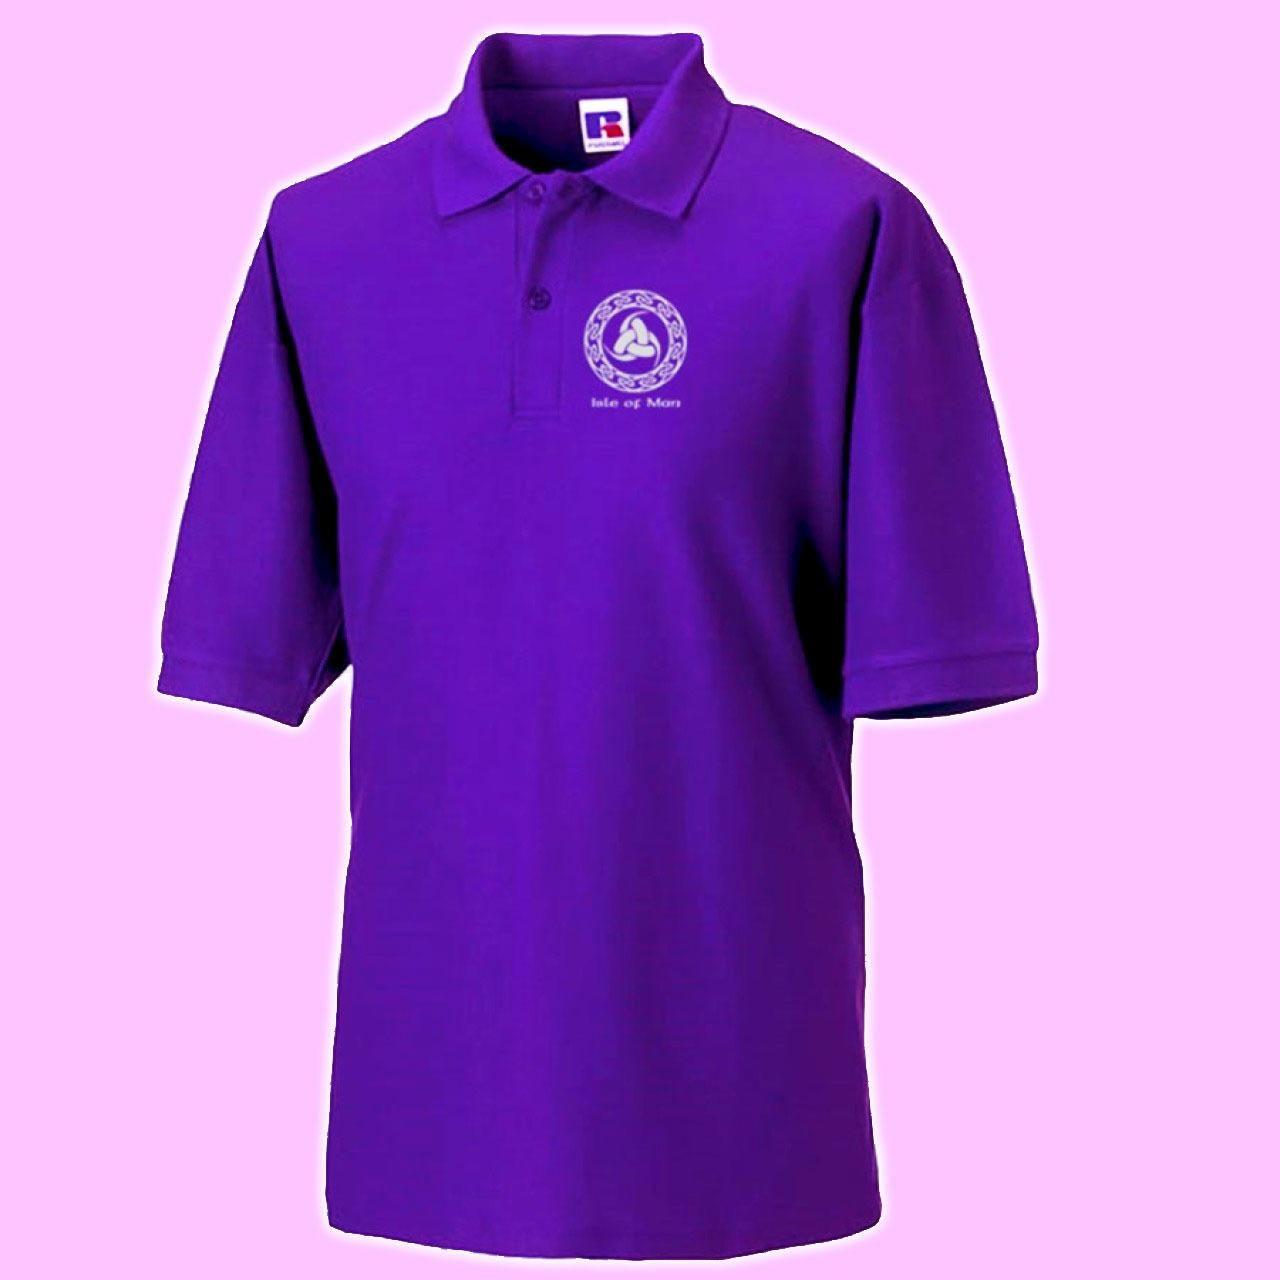 Quality purple manx polo shirt celtic legs logo mep 185 for Quality polo shirts with company logo